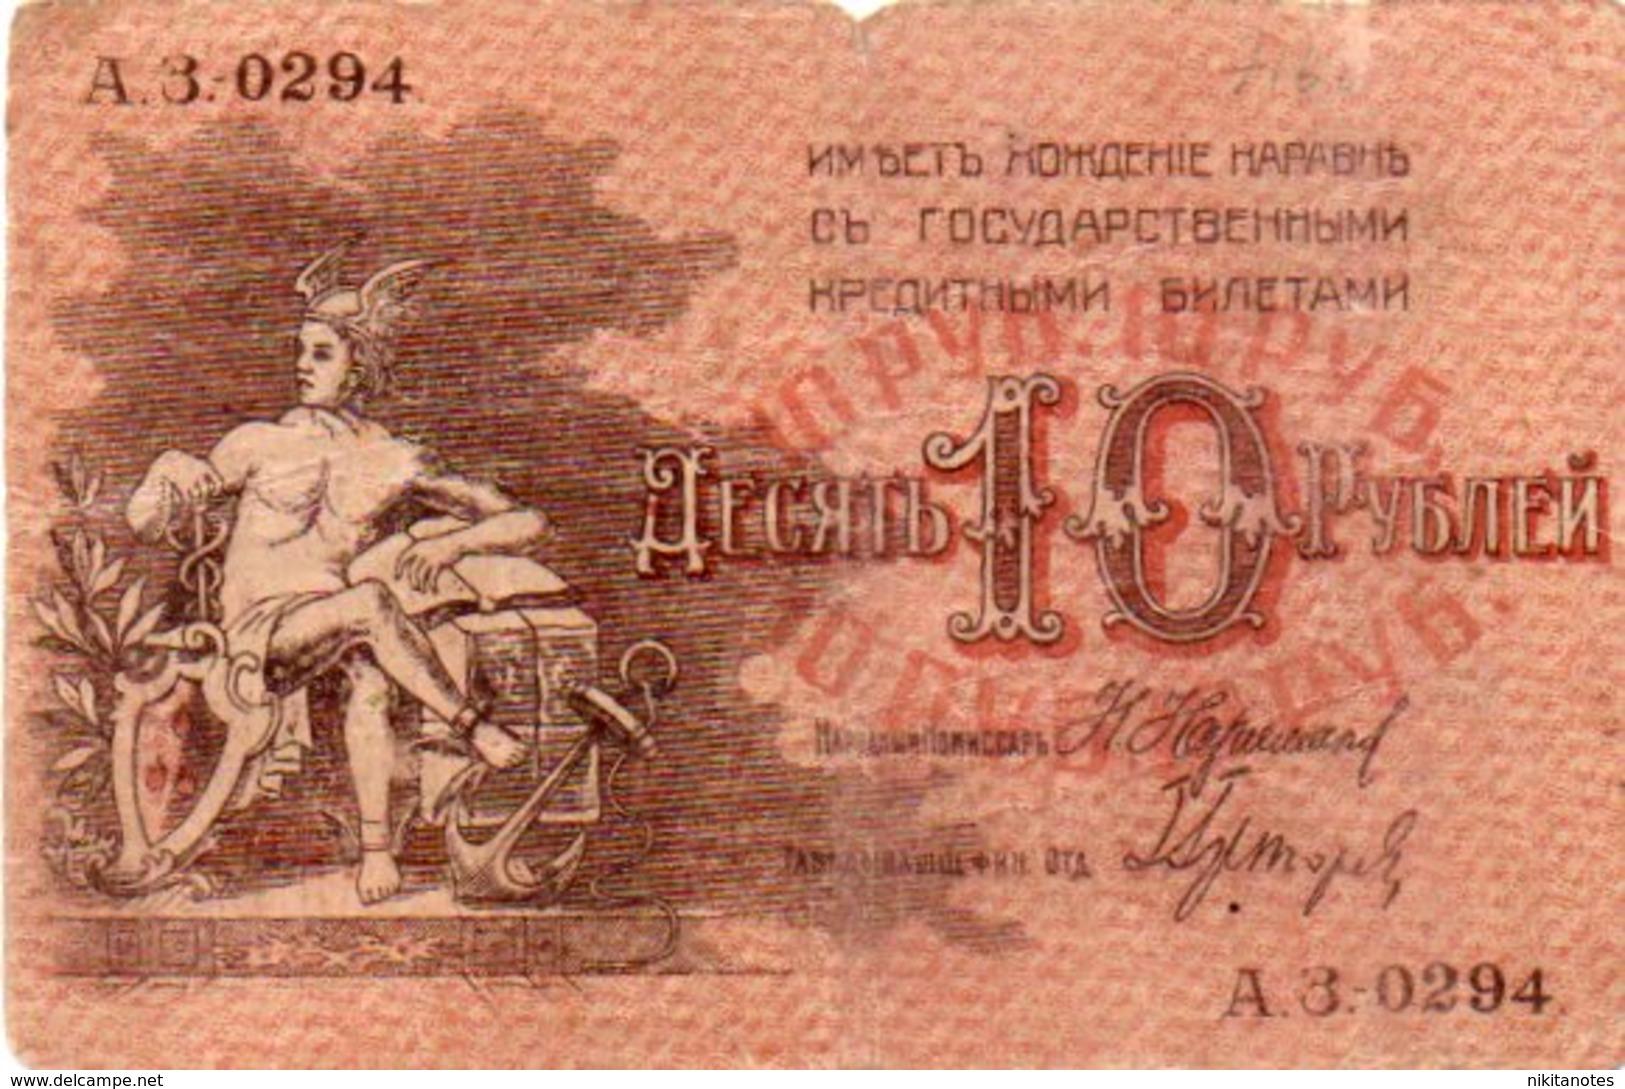 BARBADOS $ 2 Dollars - Bovell/Trafalgar Square Unc - Barbados